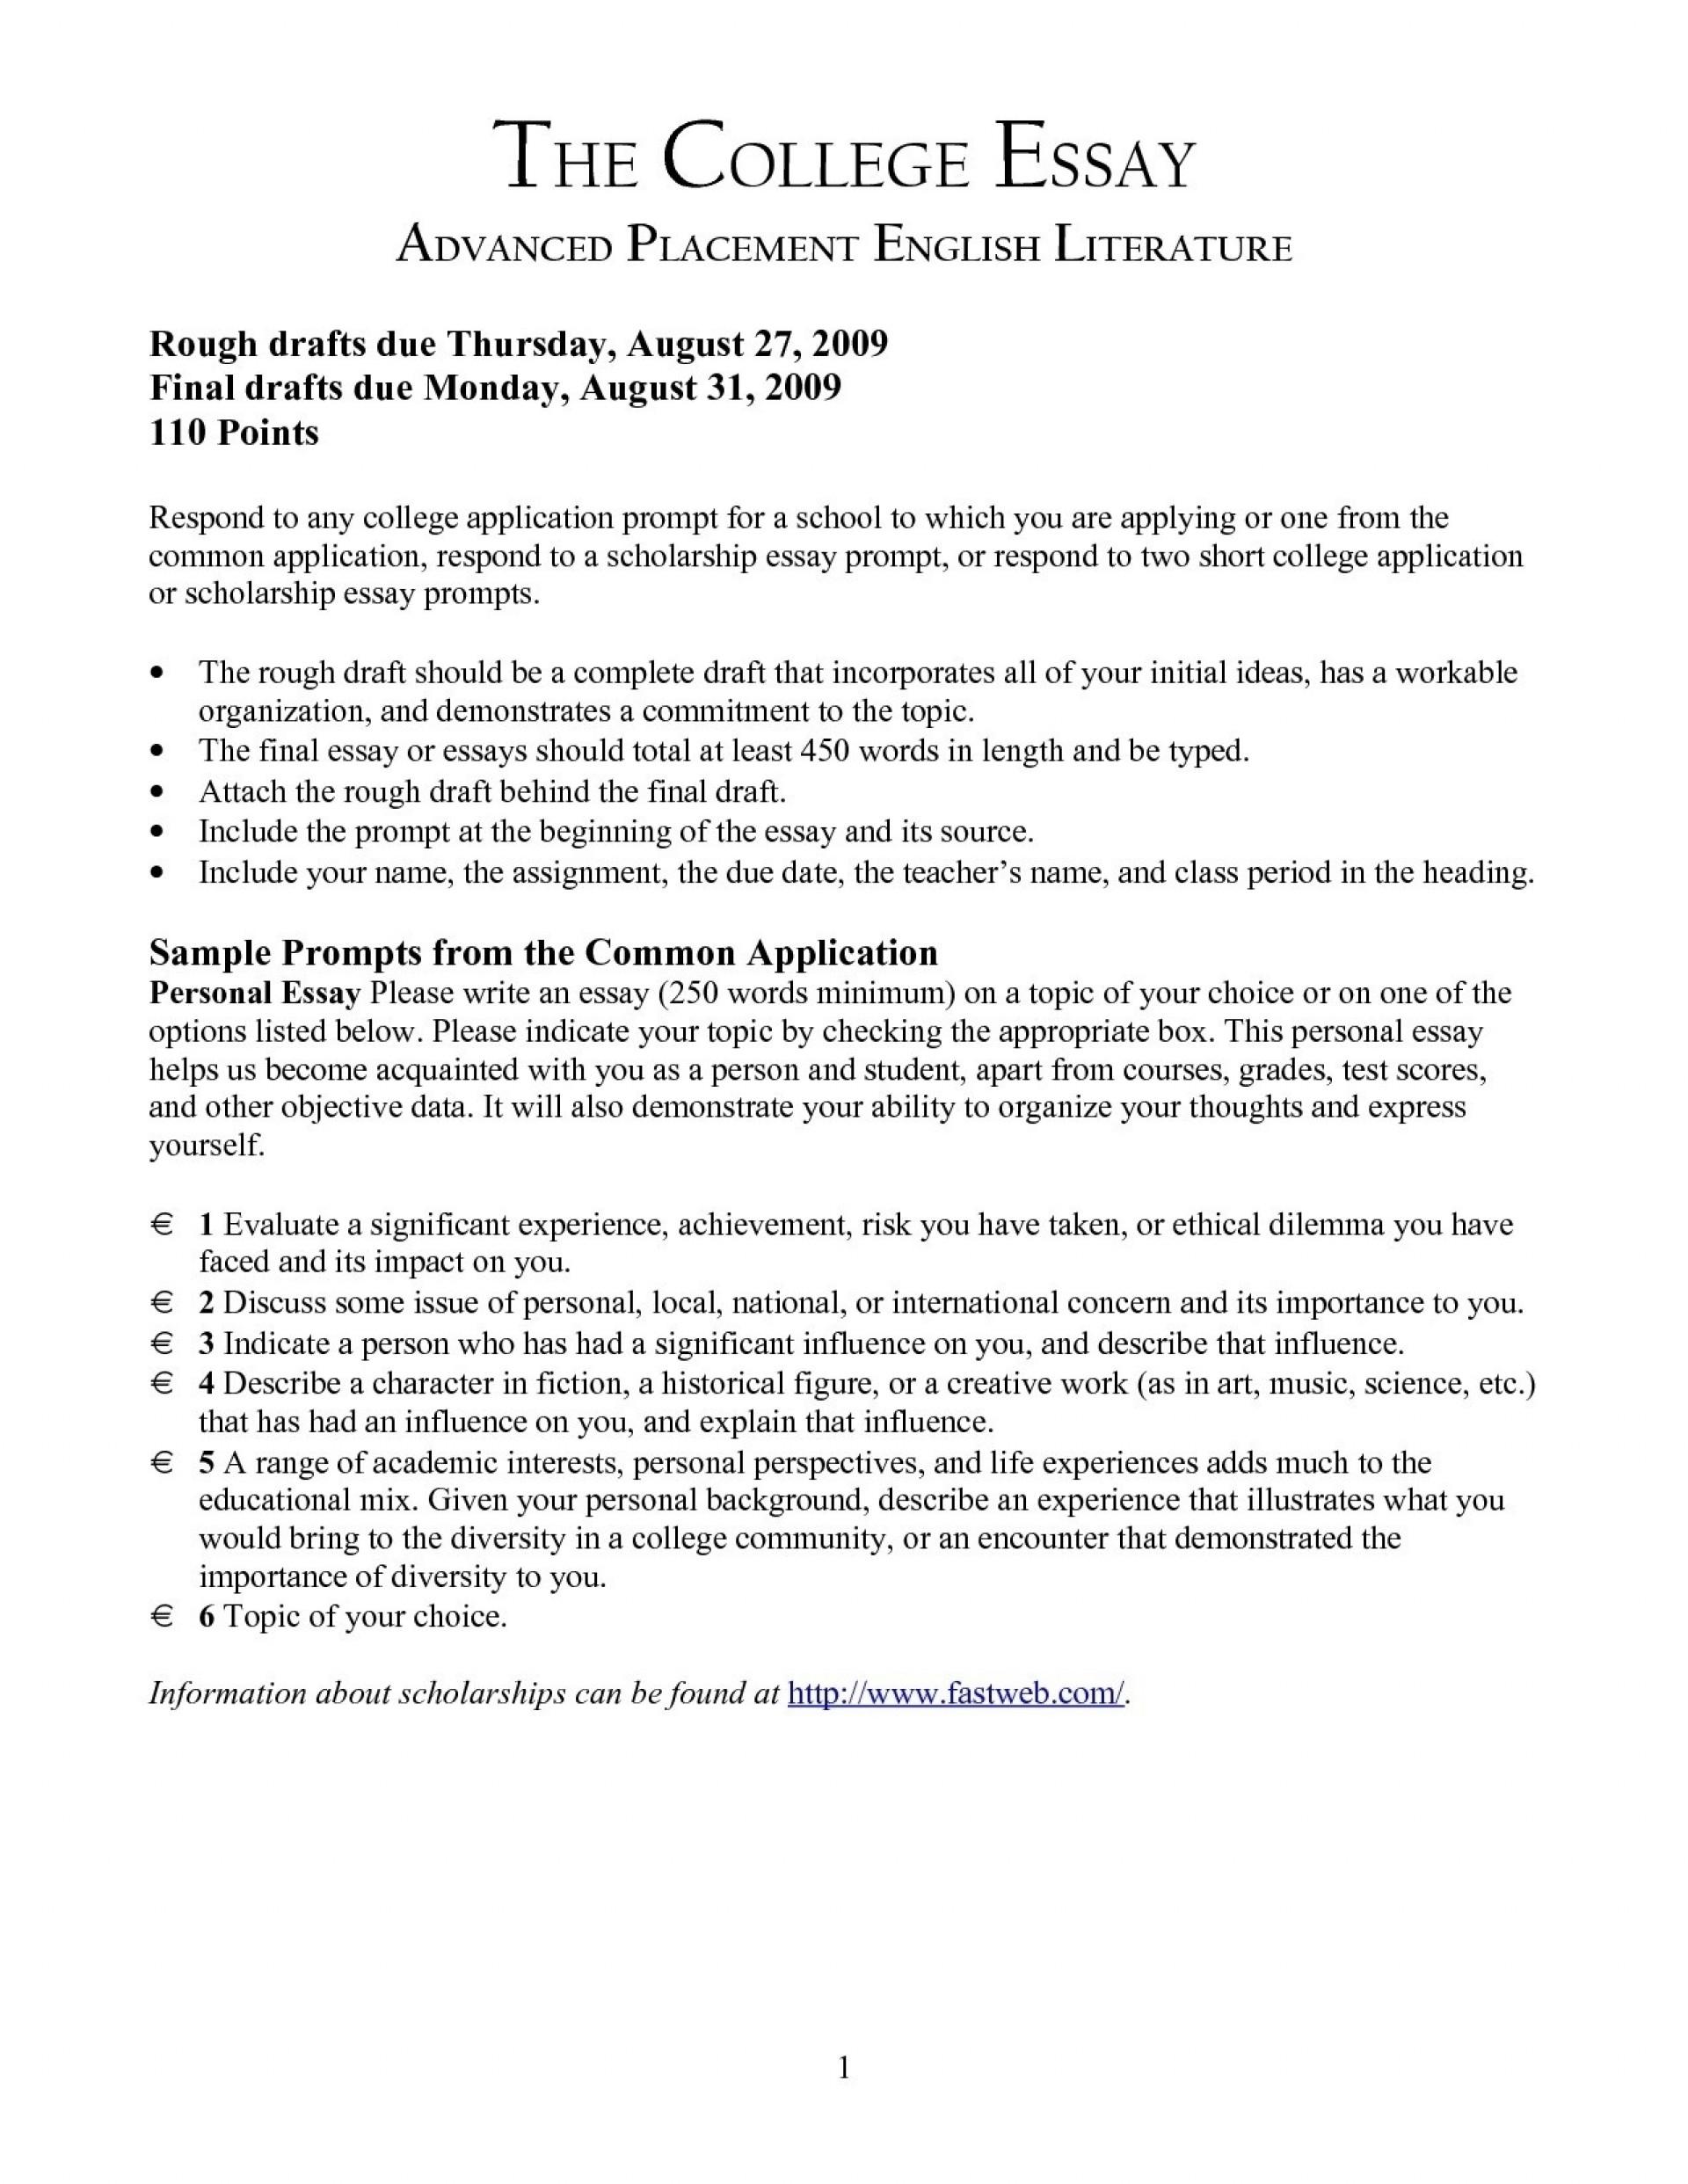 002 Scholarship Essay Prompts Example College Printables Corner Topics List Format Cover Letter And Bussin Magnificent Robertson 2018-19 Vanderbilt Washington Lee Johnson 1920